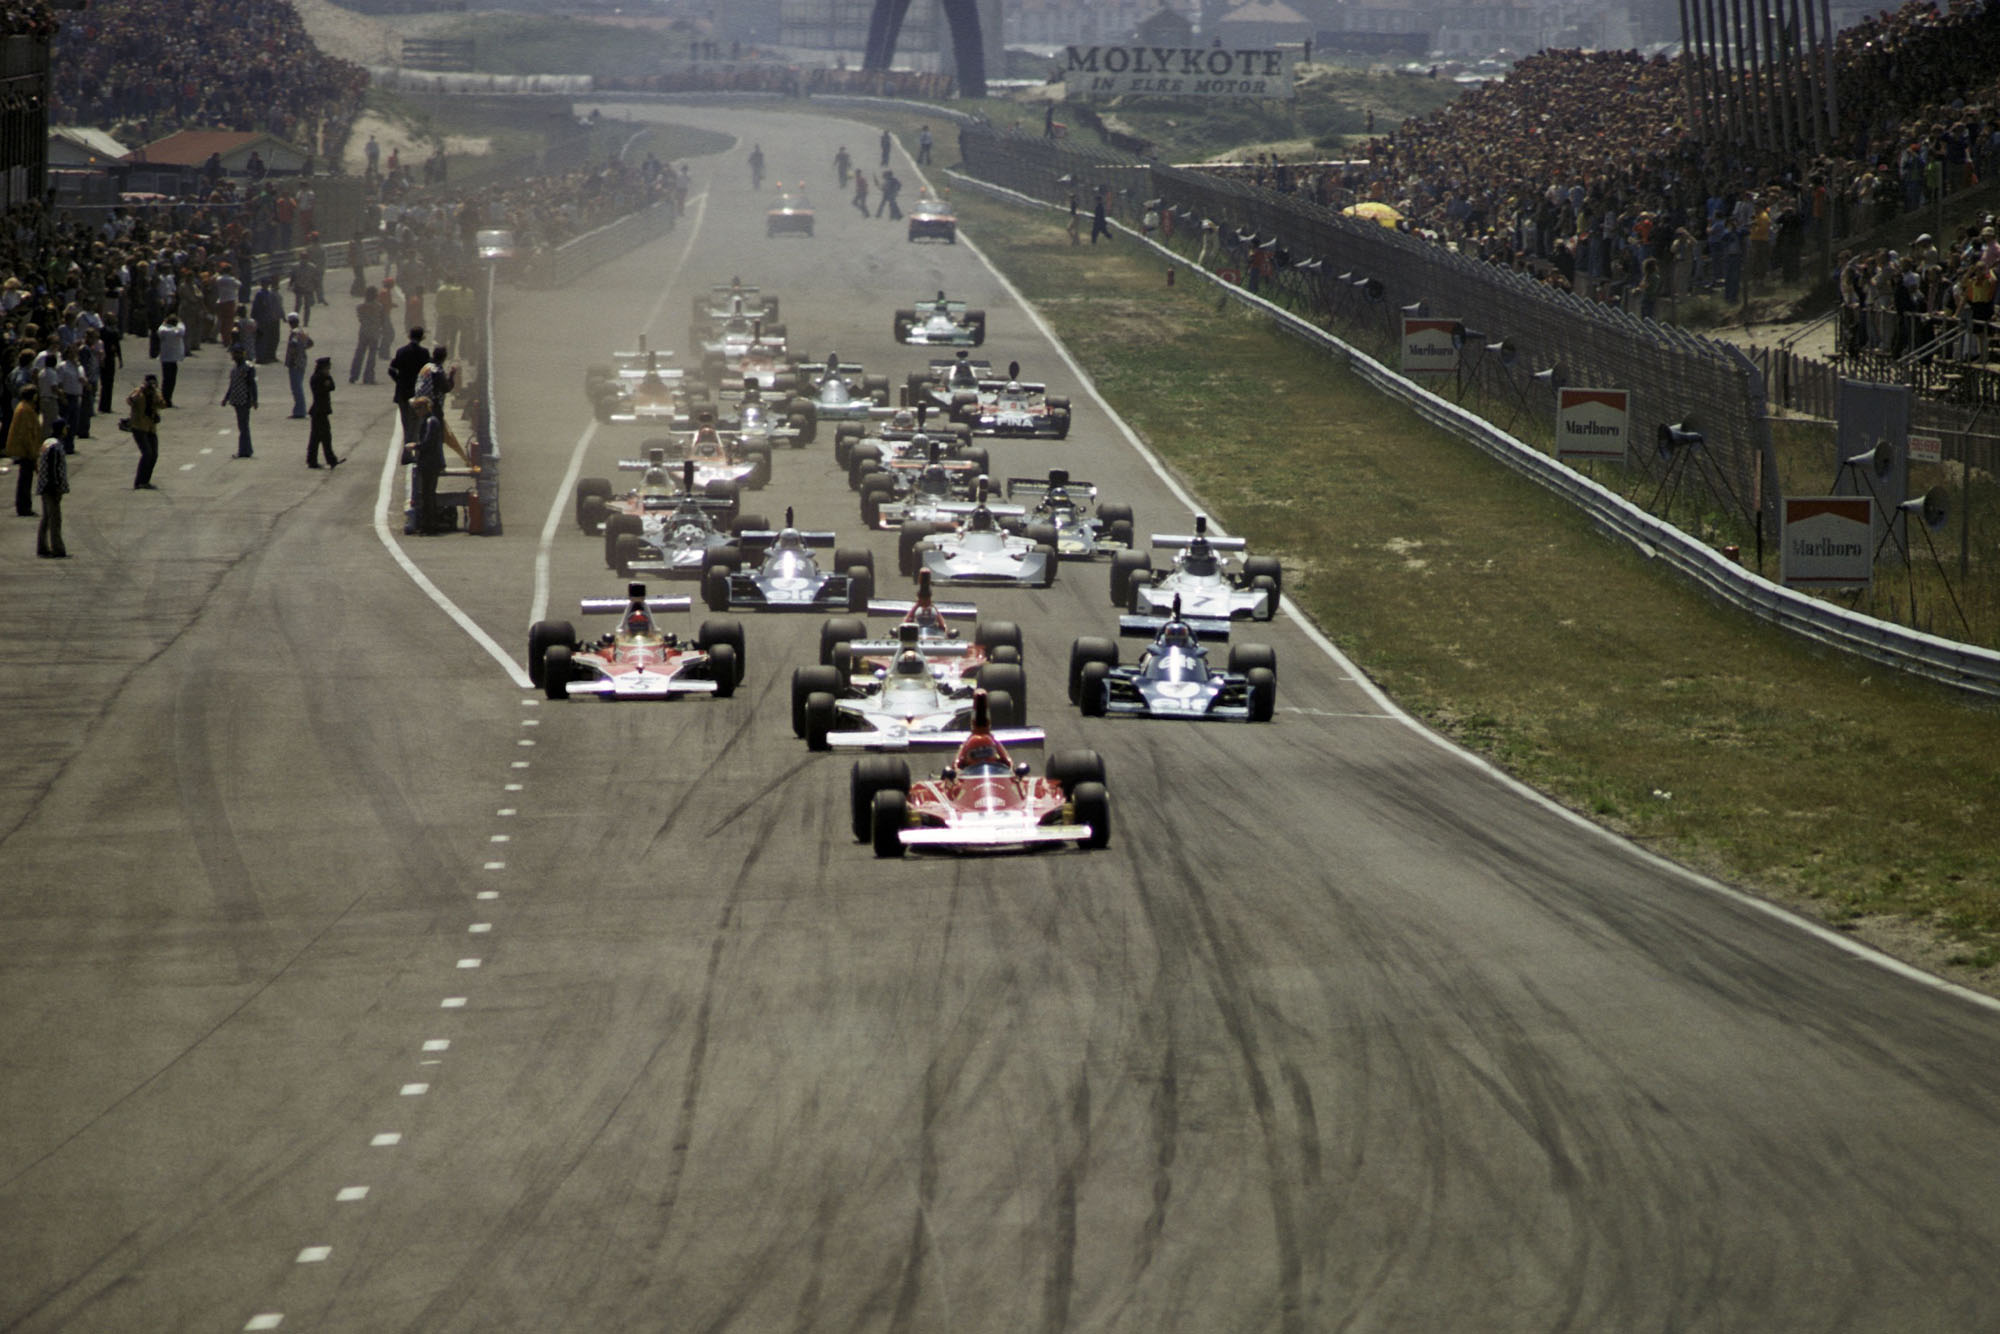 Niki Lauda leads at the start of the 1974 Dutch Grand Prix.